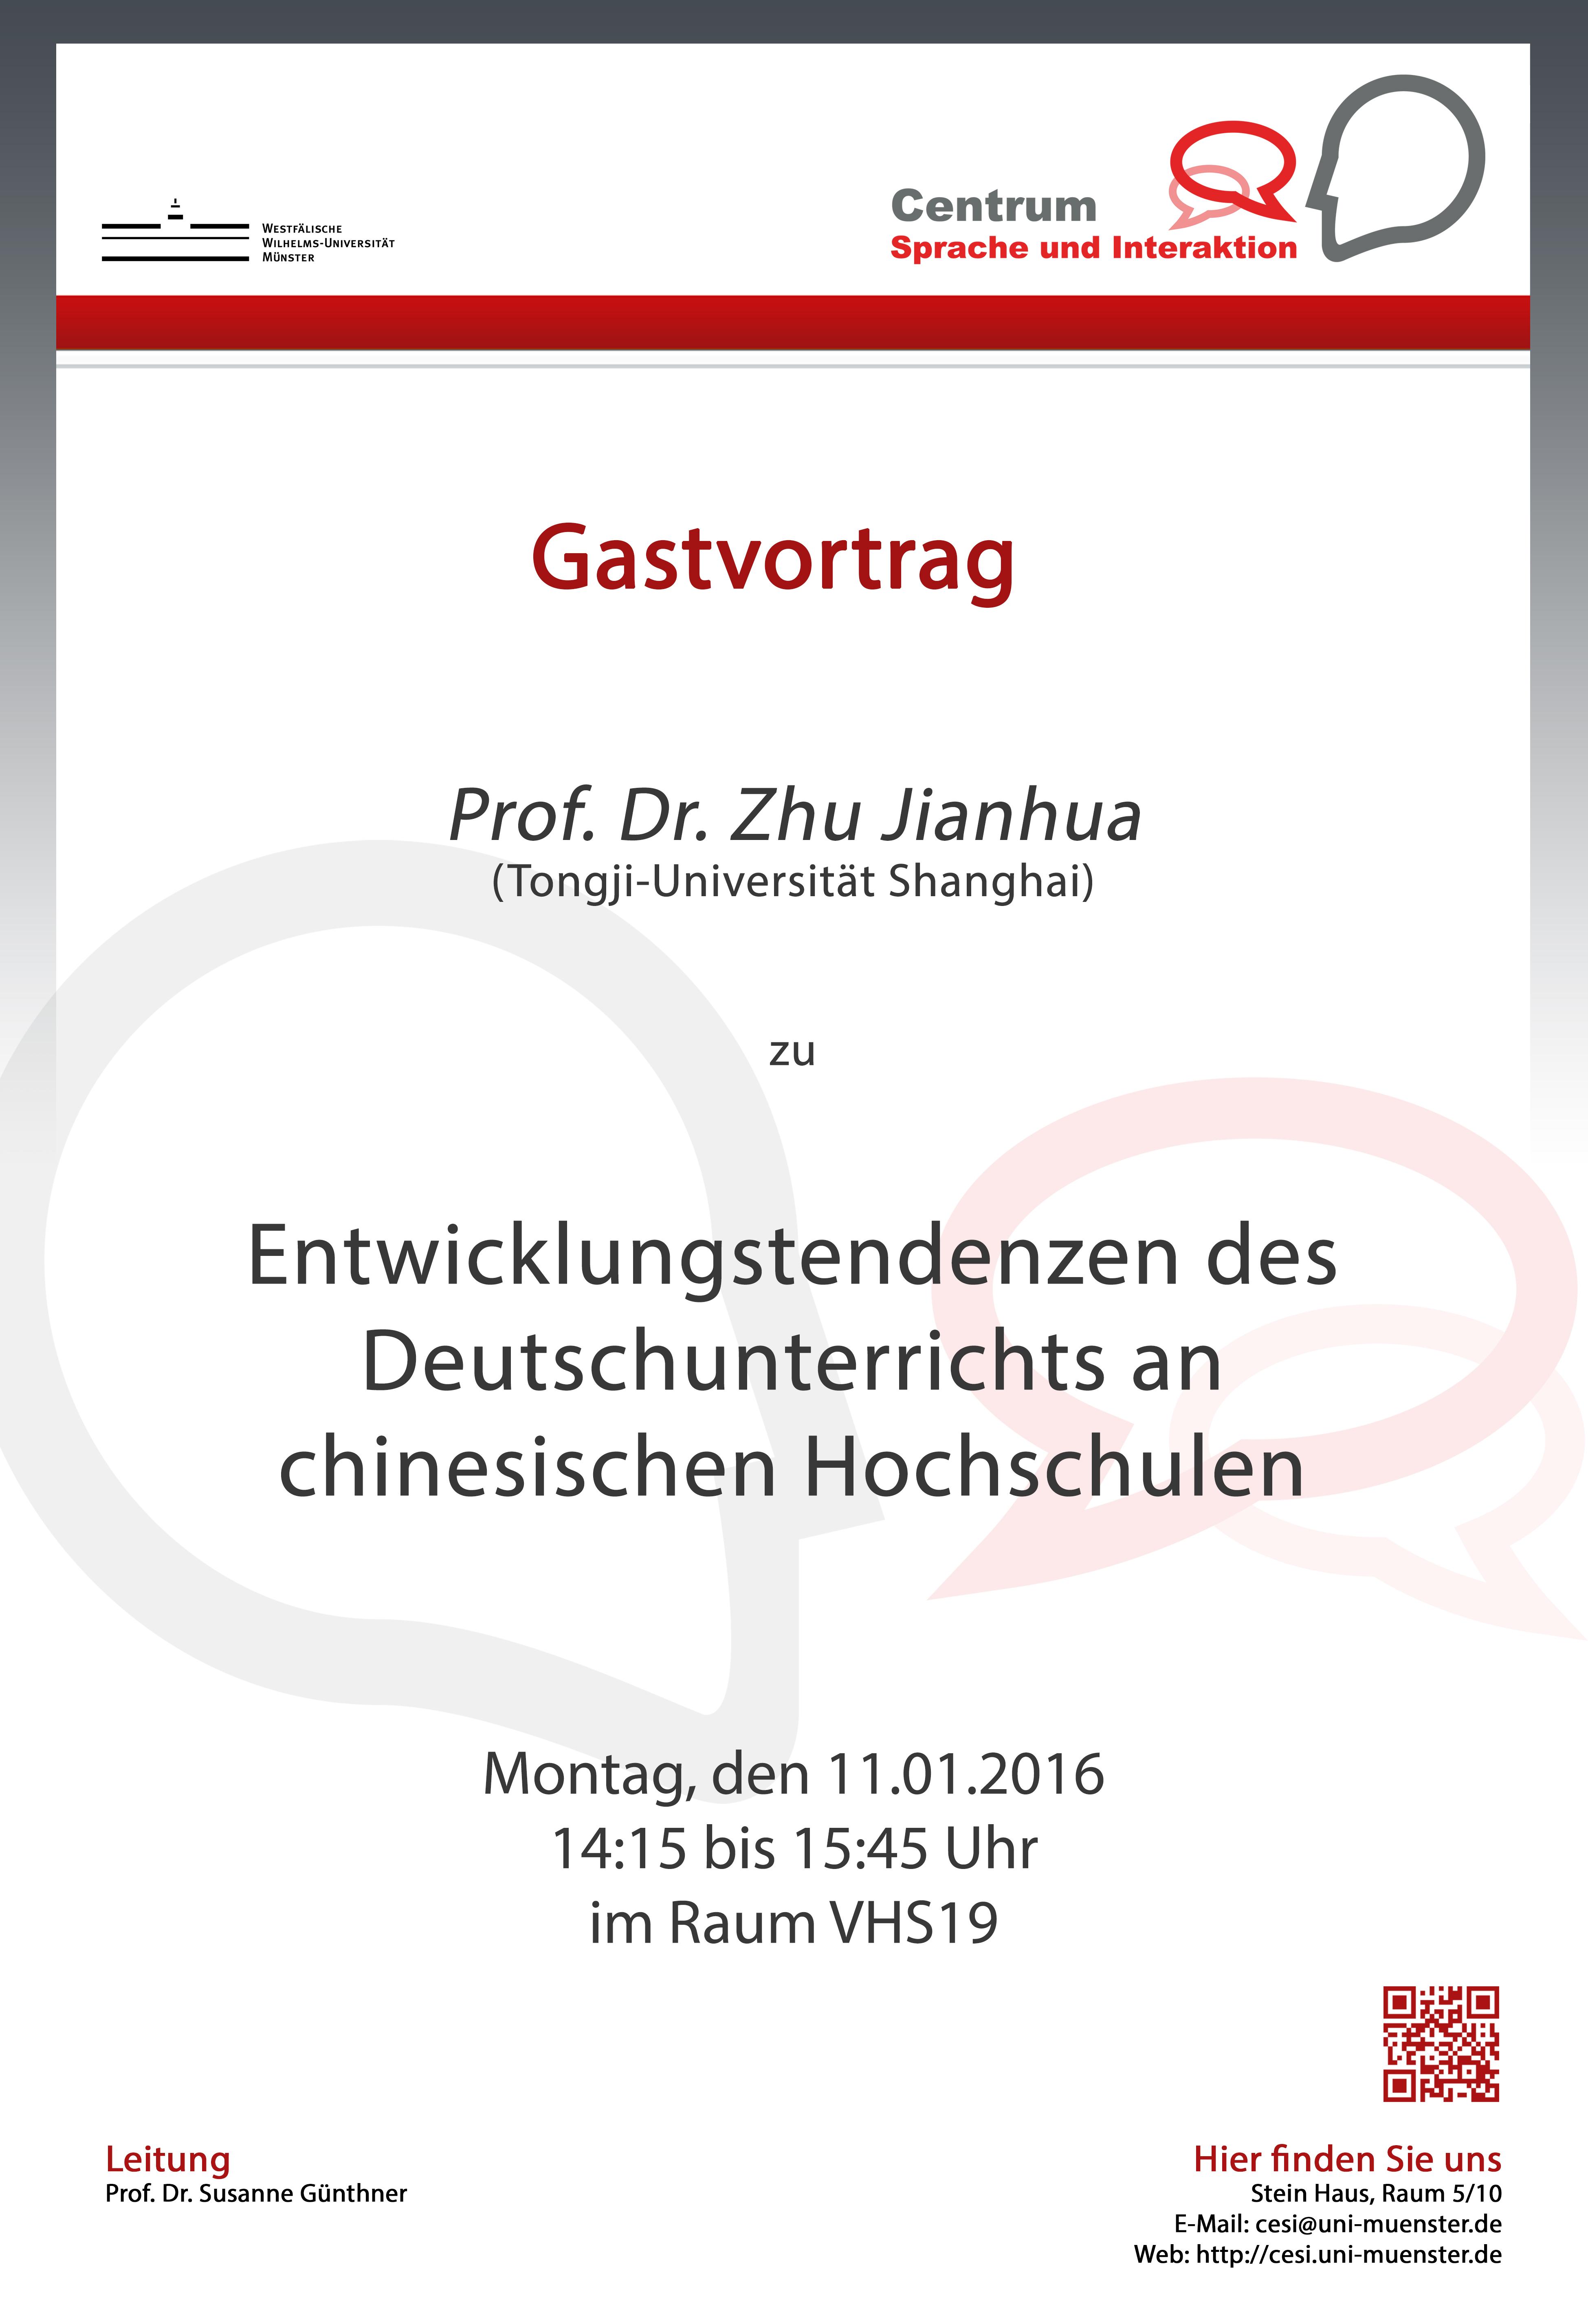 Groß Rede Pathologen Lebenslauf Vorlage Galerie ...